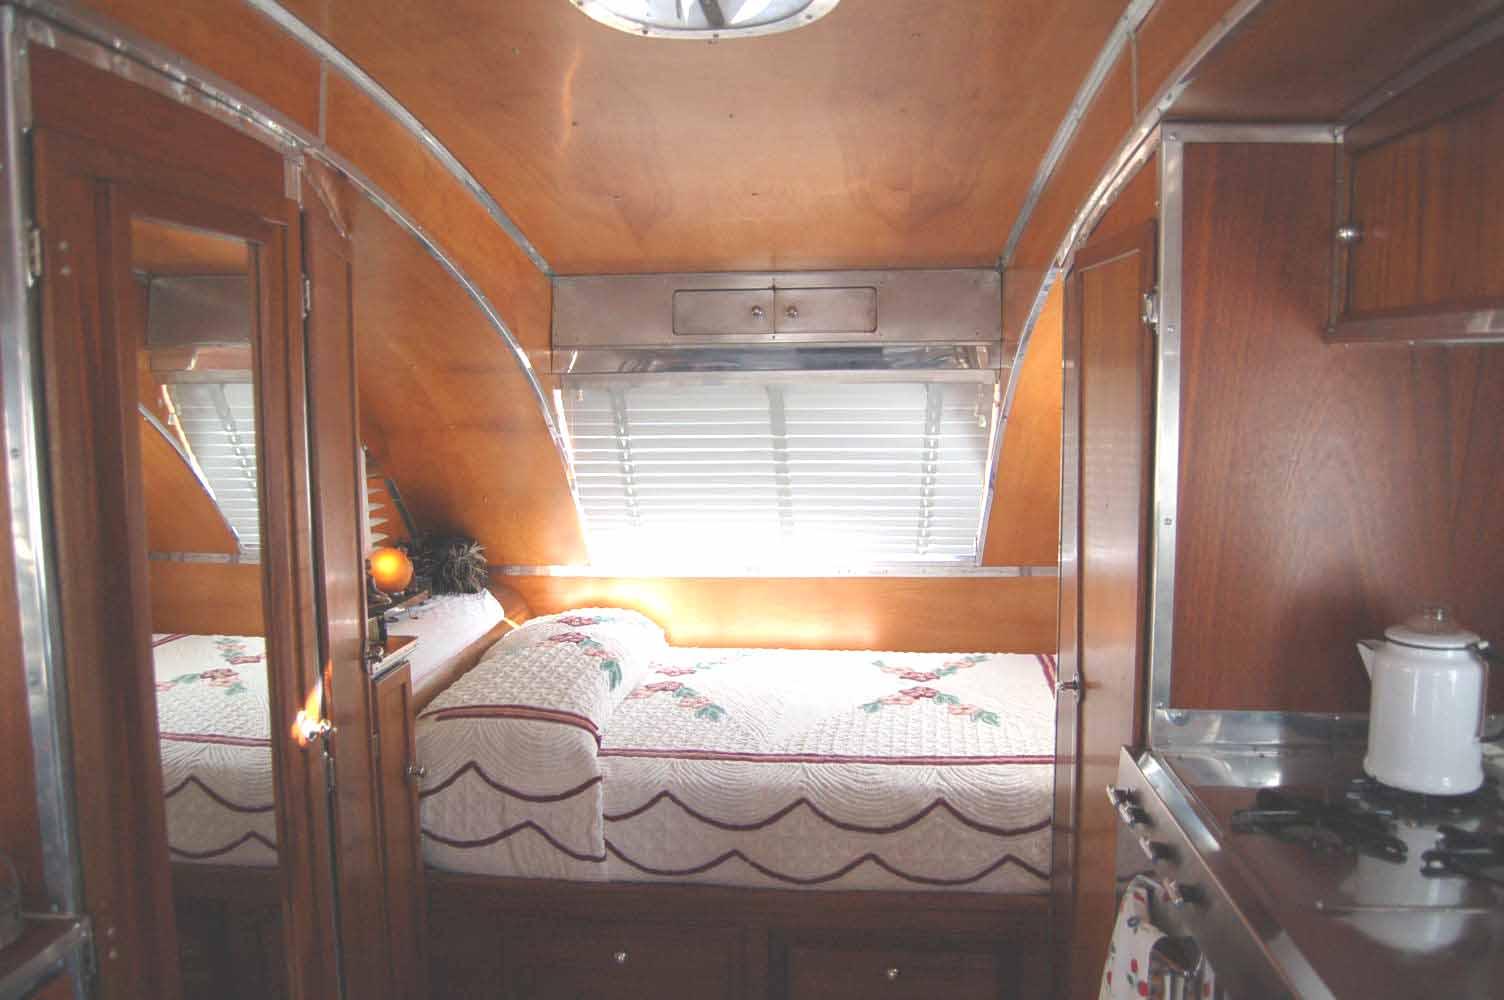 Picture Shows Beautiful Bedroom In Restored 1947 Aero Flite Trailer